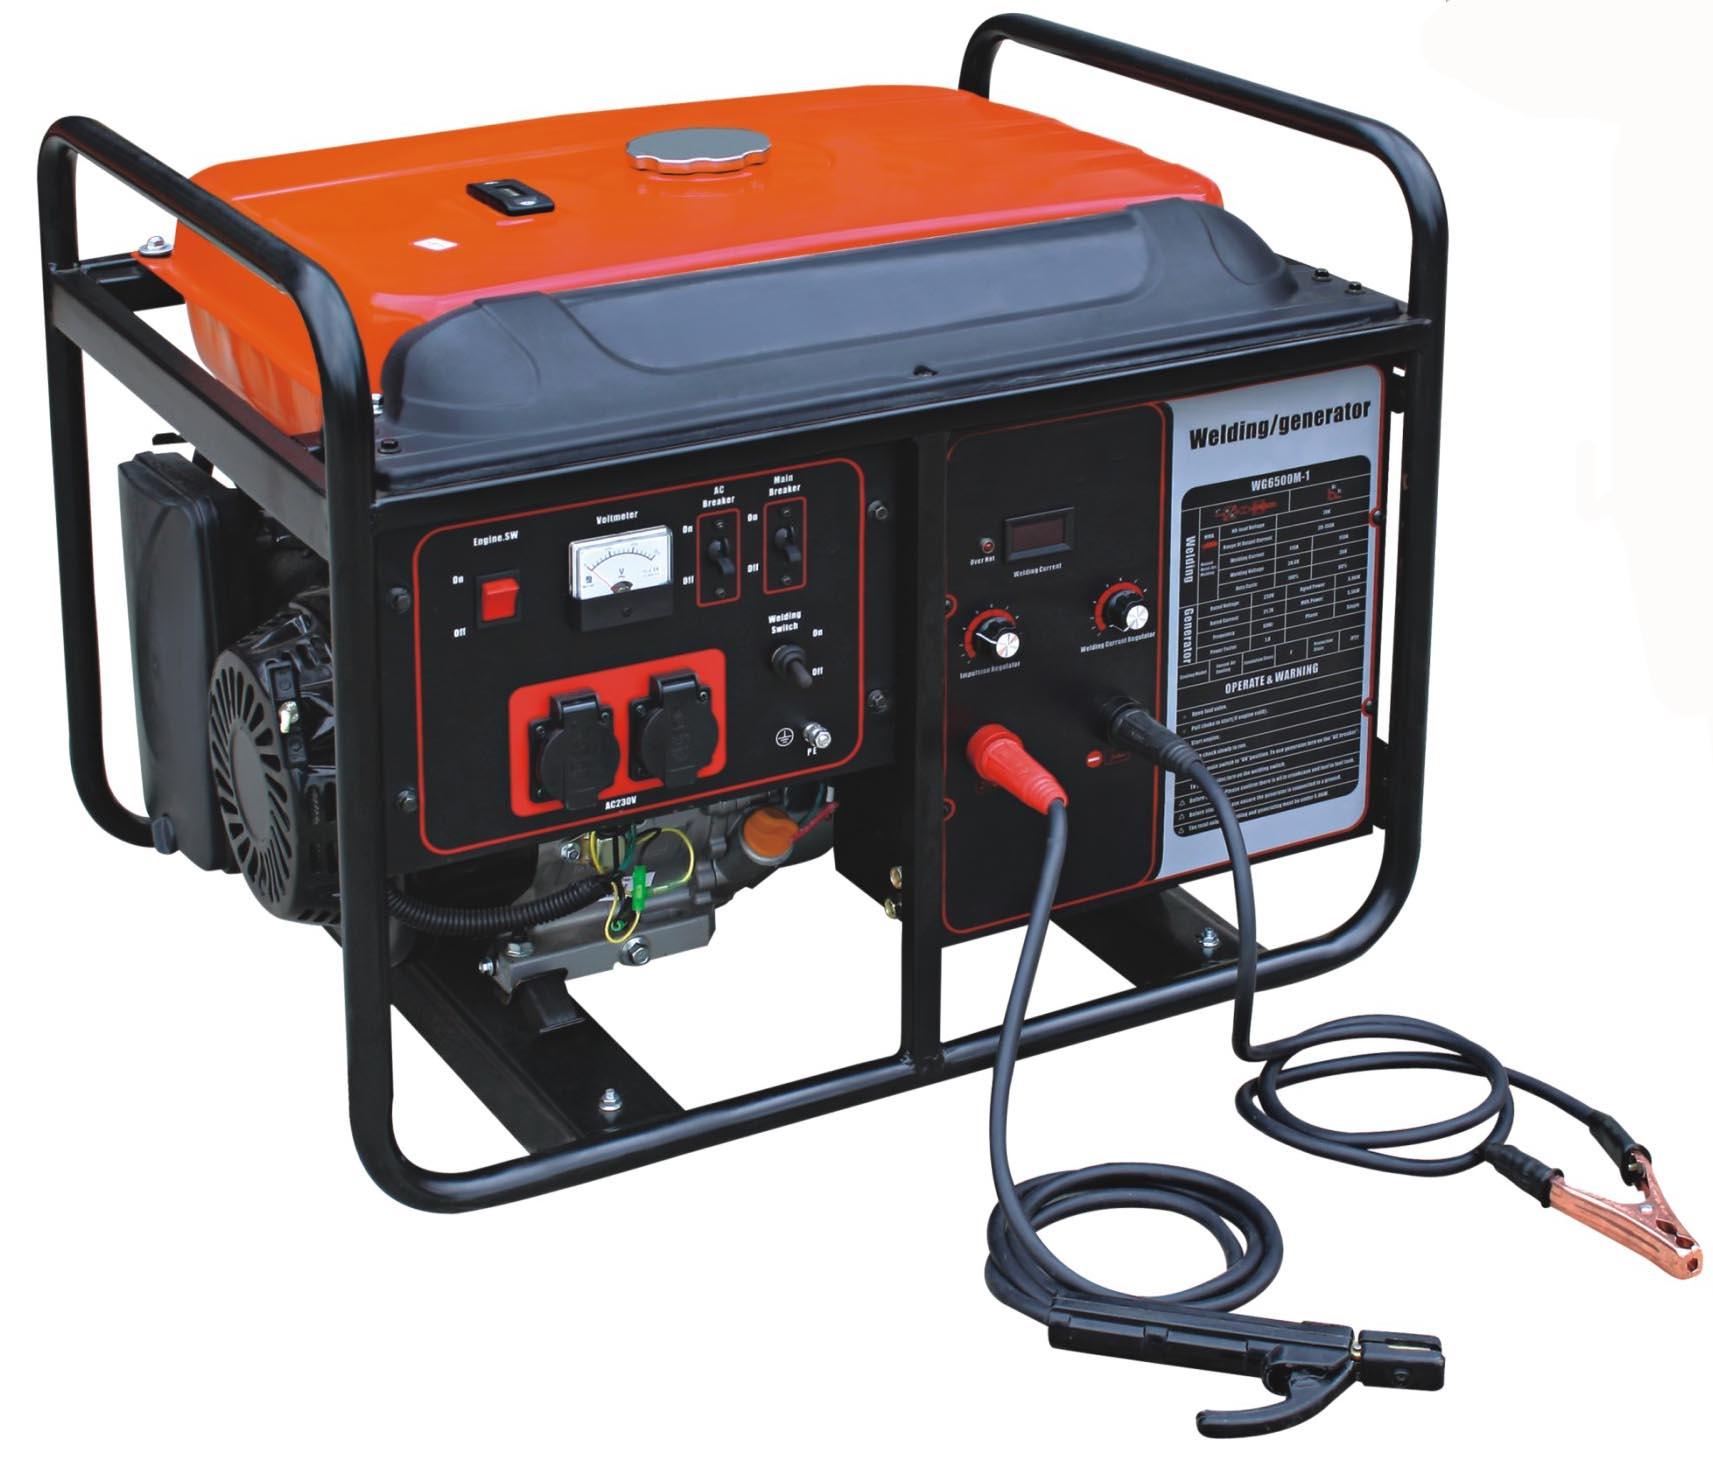 Welding Machine With Generator